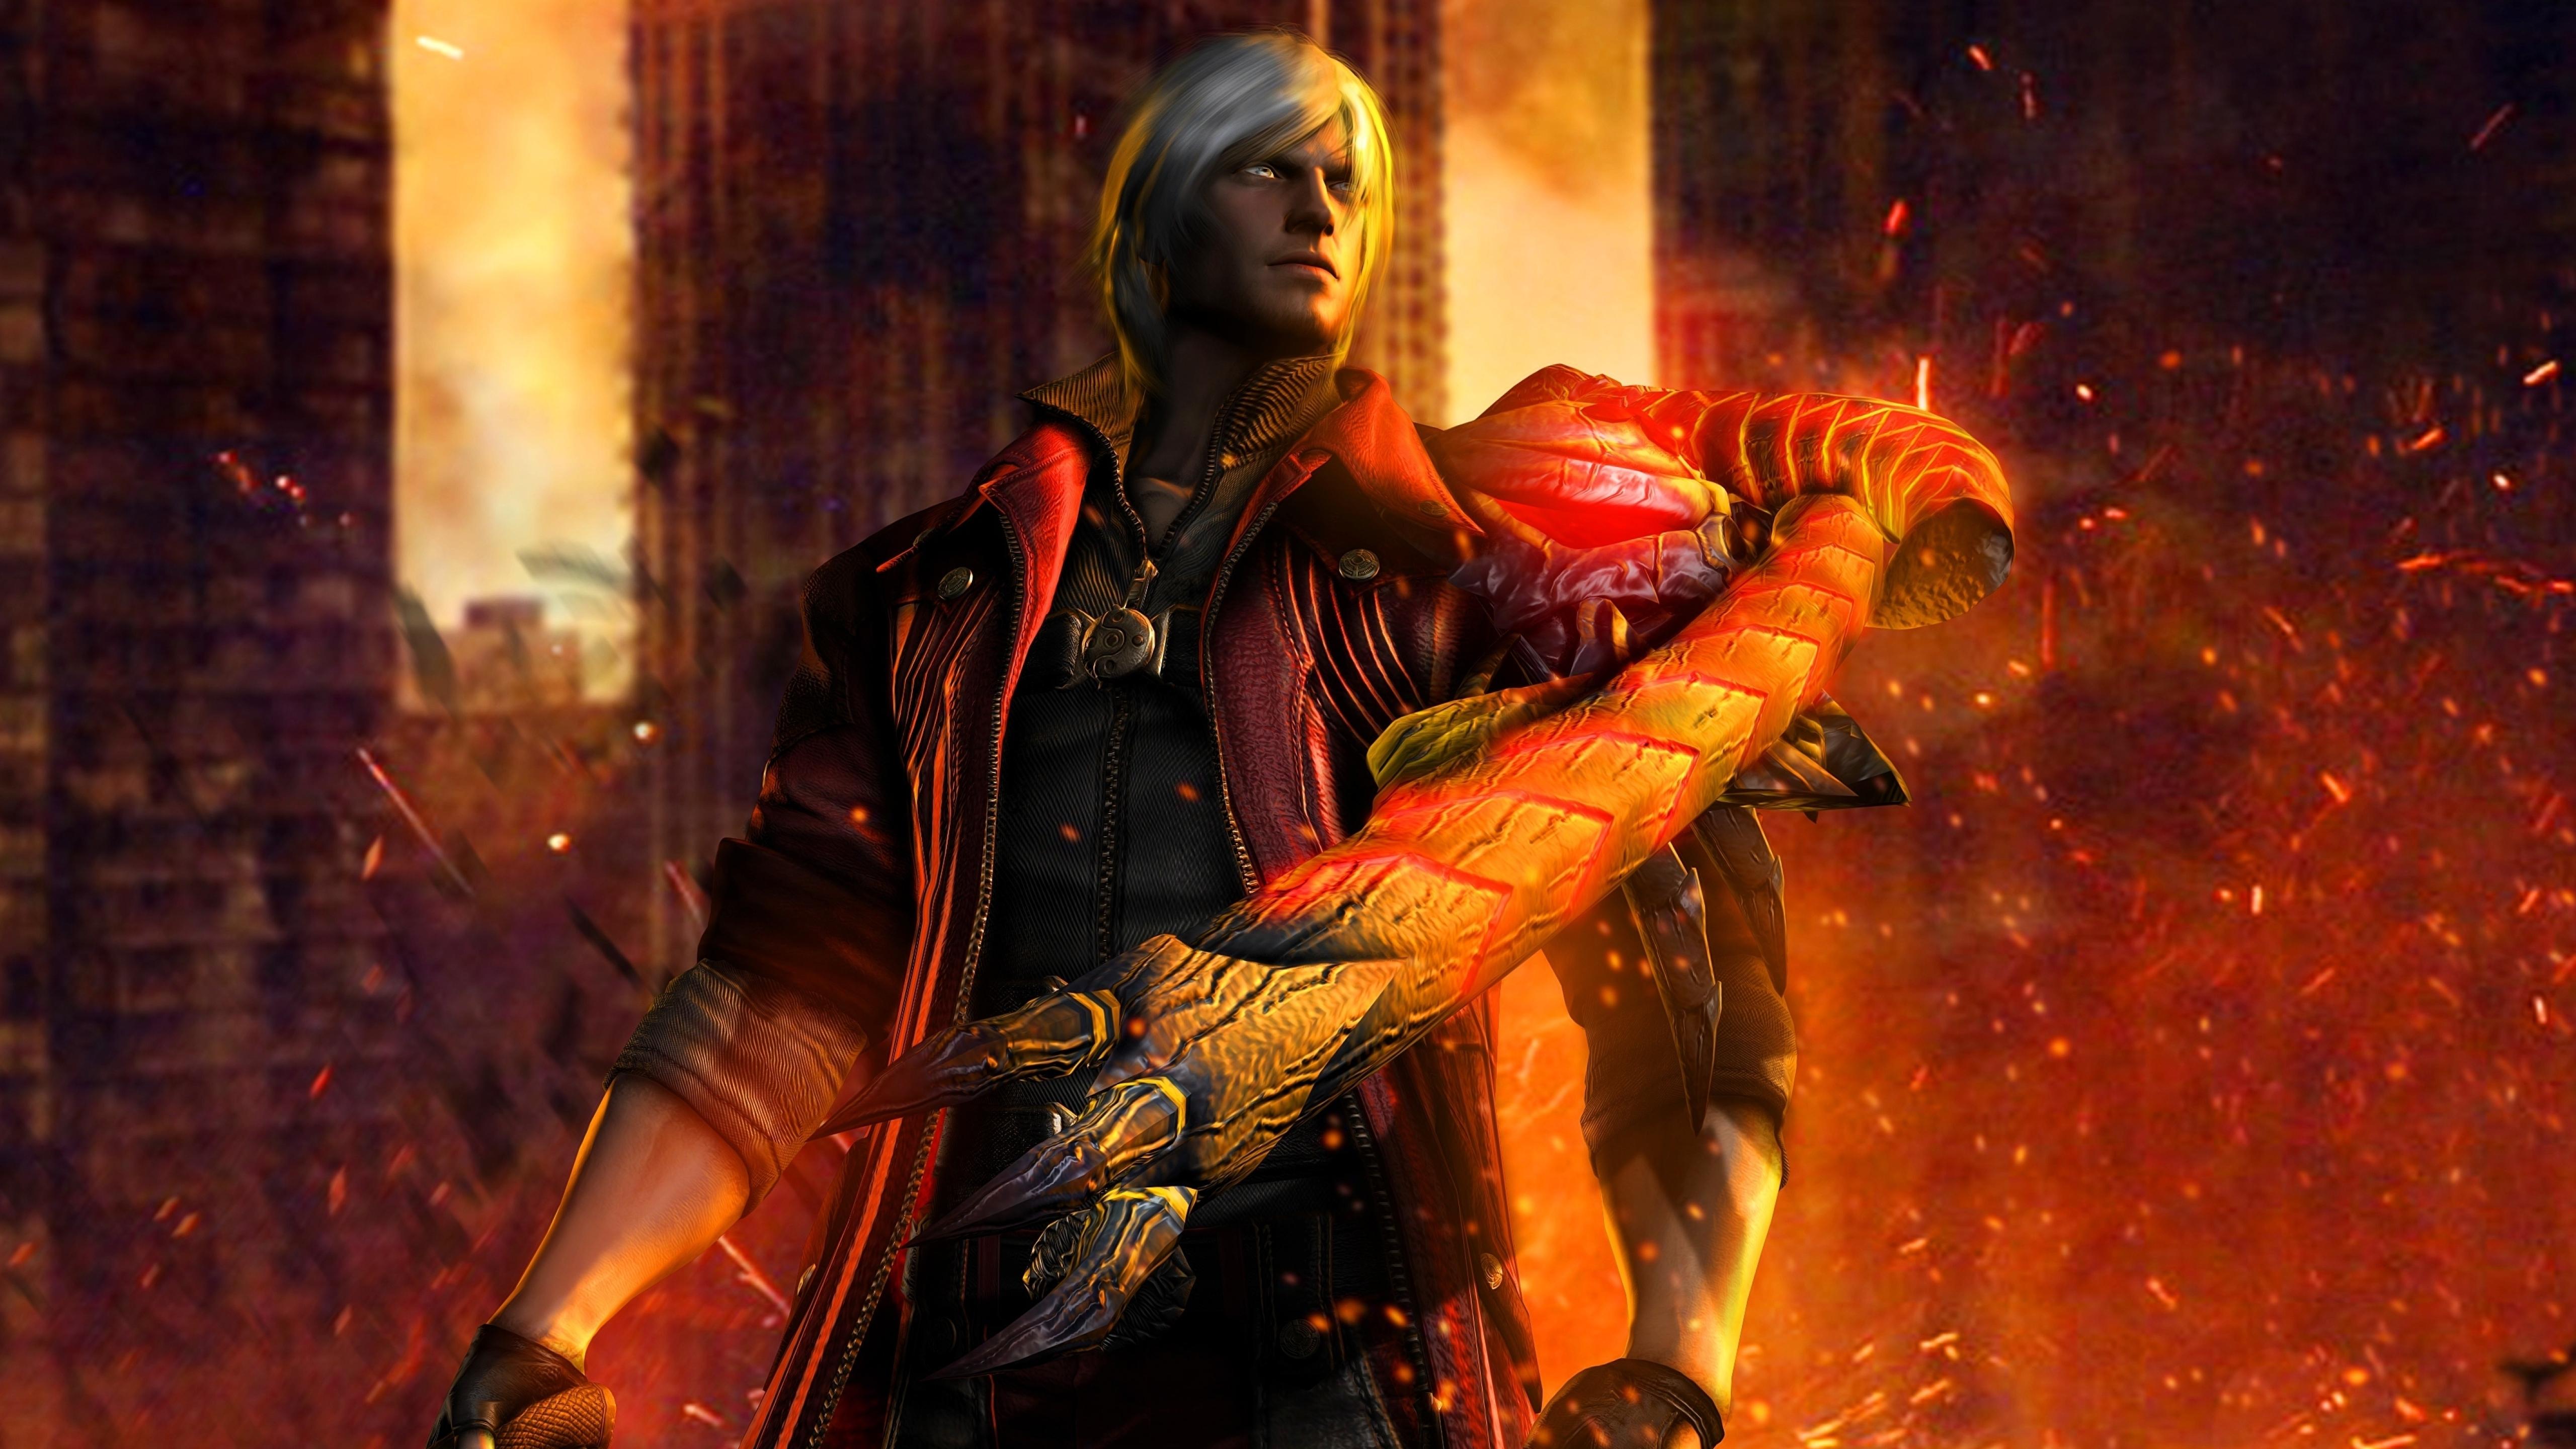 5120x2880 Dante Devil May Cry 4 5k Wallpaper Hd Games 4k